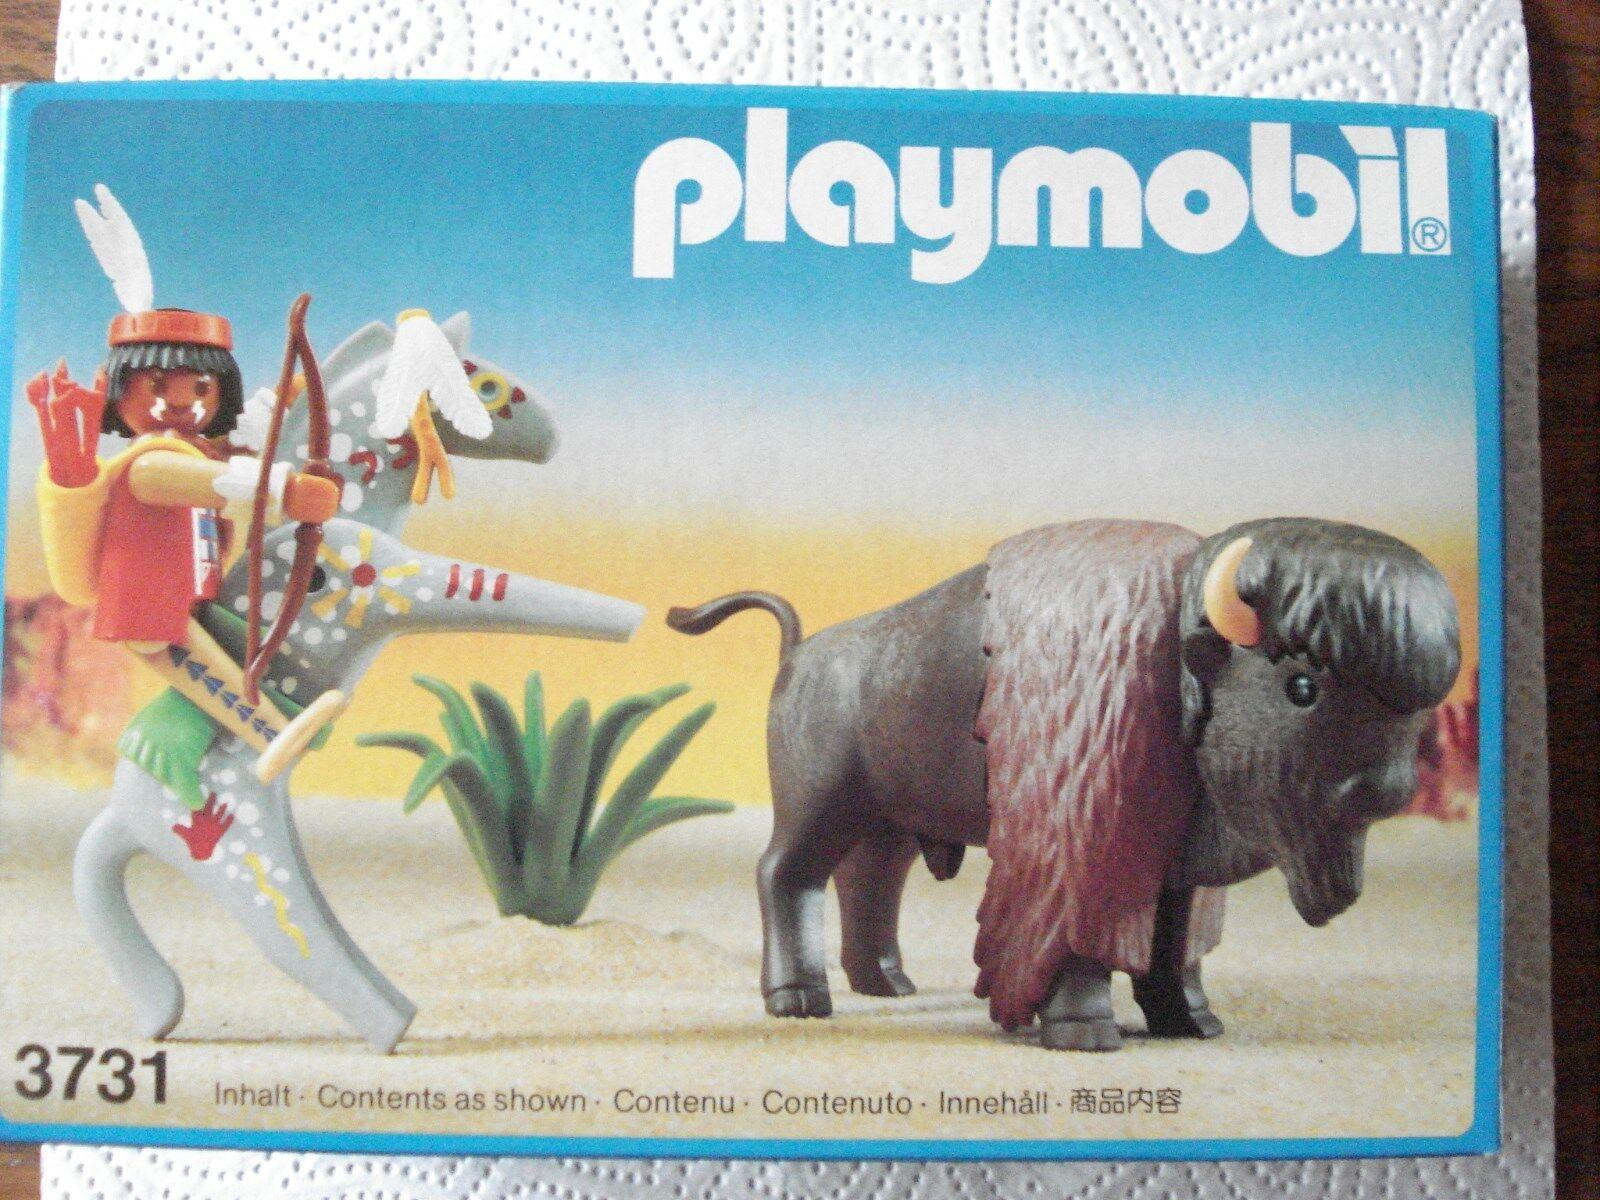 Playmobil System Nr. 3731 Indianer mit Bison1988, Neu & OVP